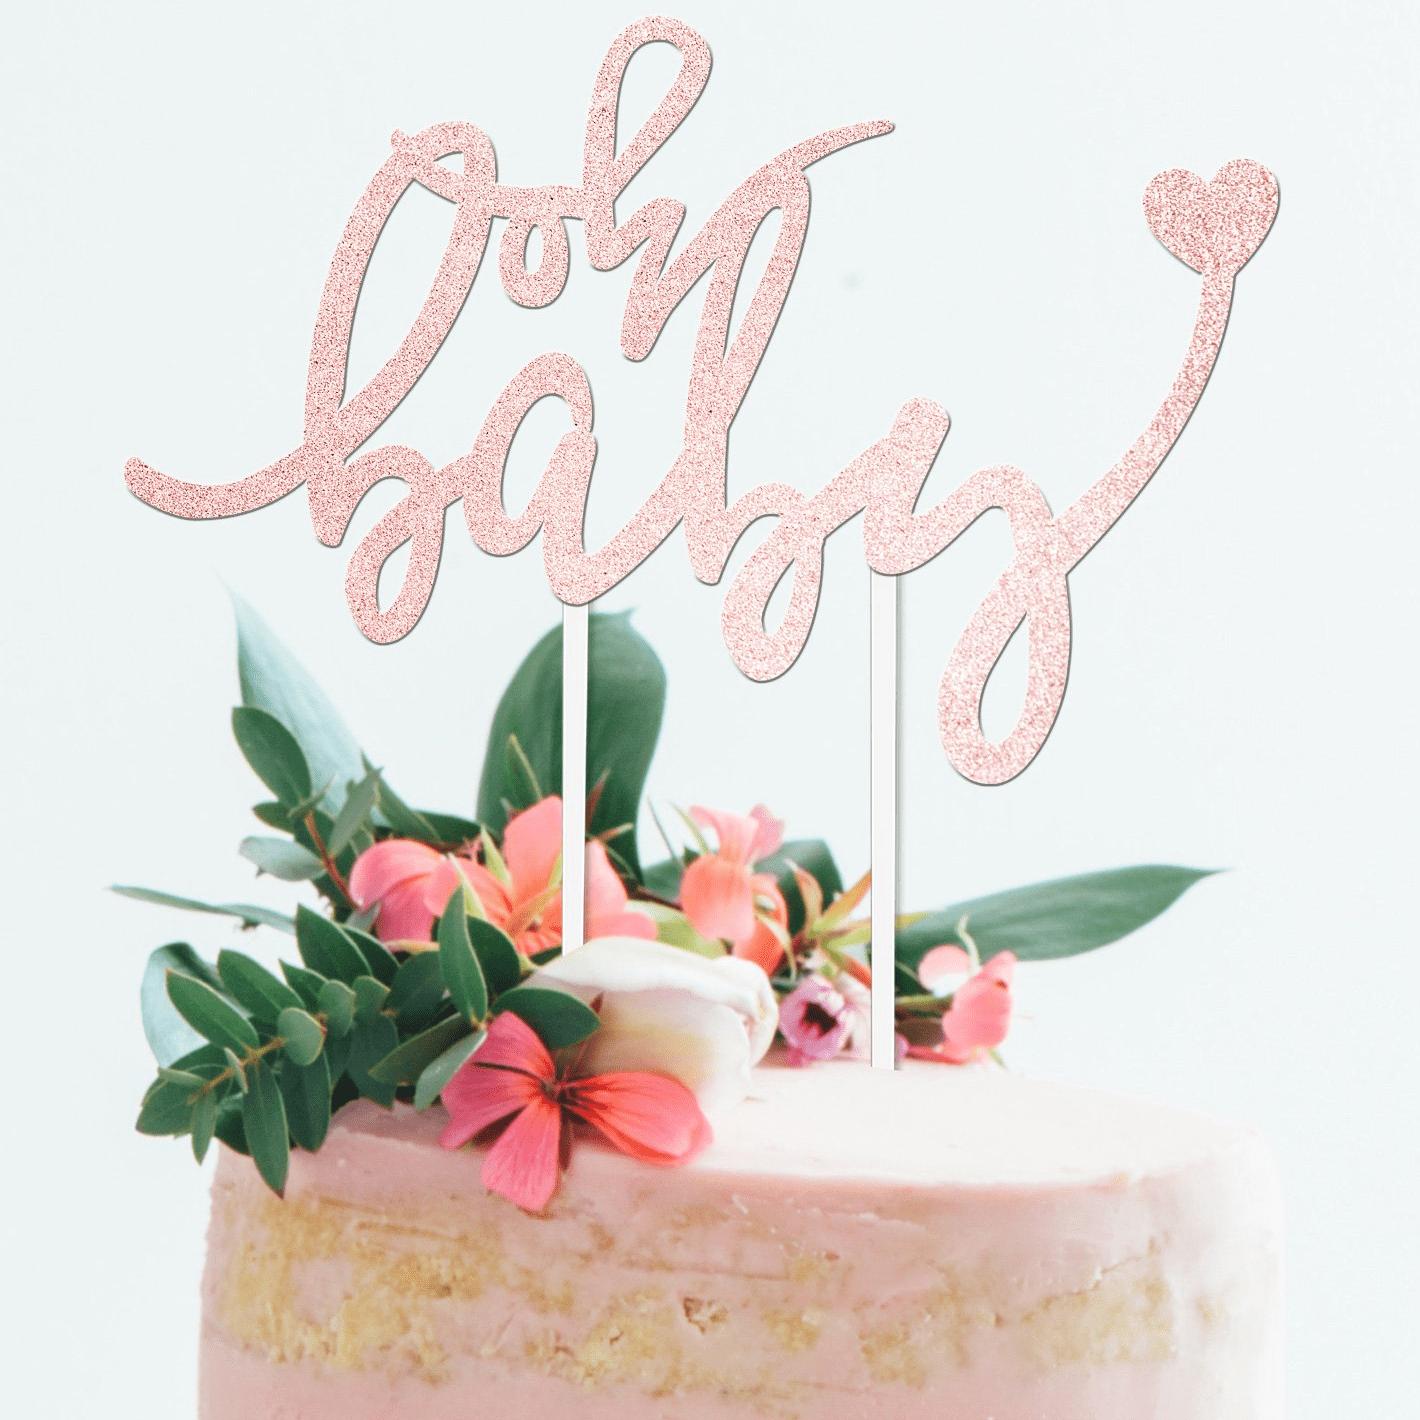 Baby Shower Baby Boy Gender Reveal Pregnancy Announcement Glitter Cake Topper